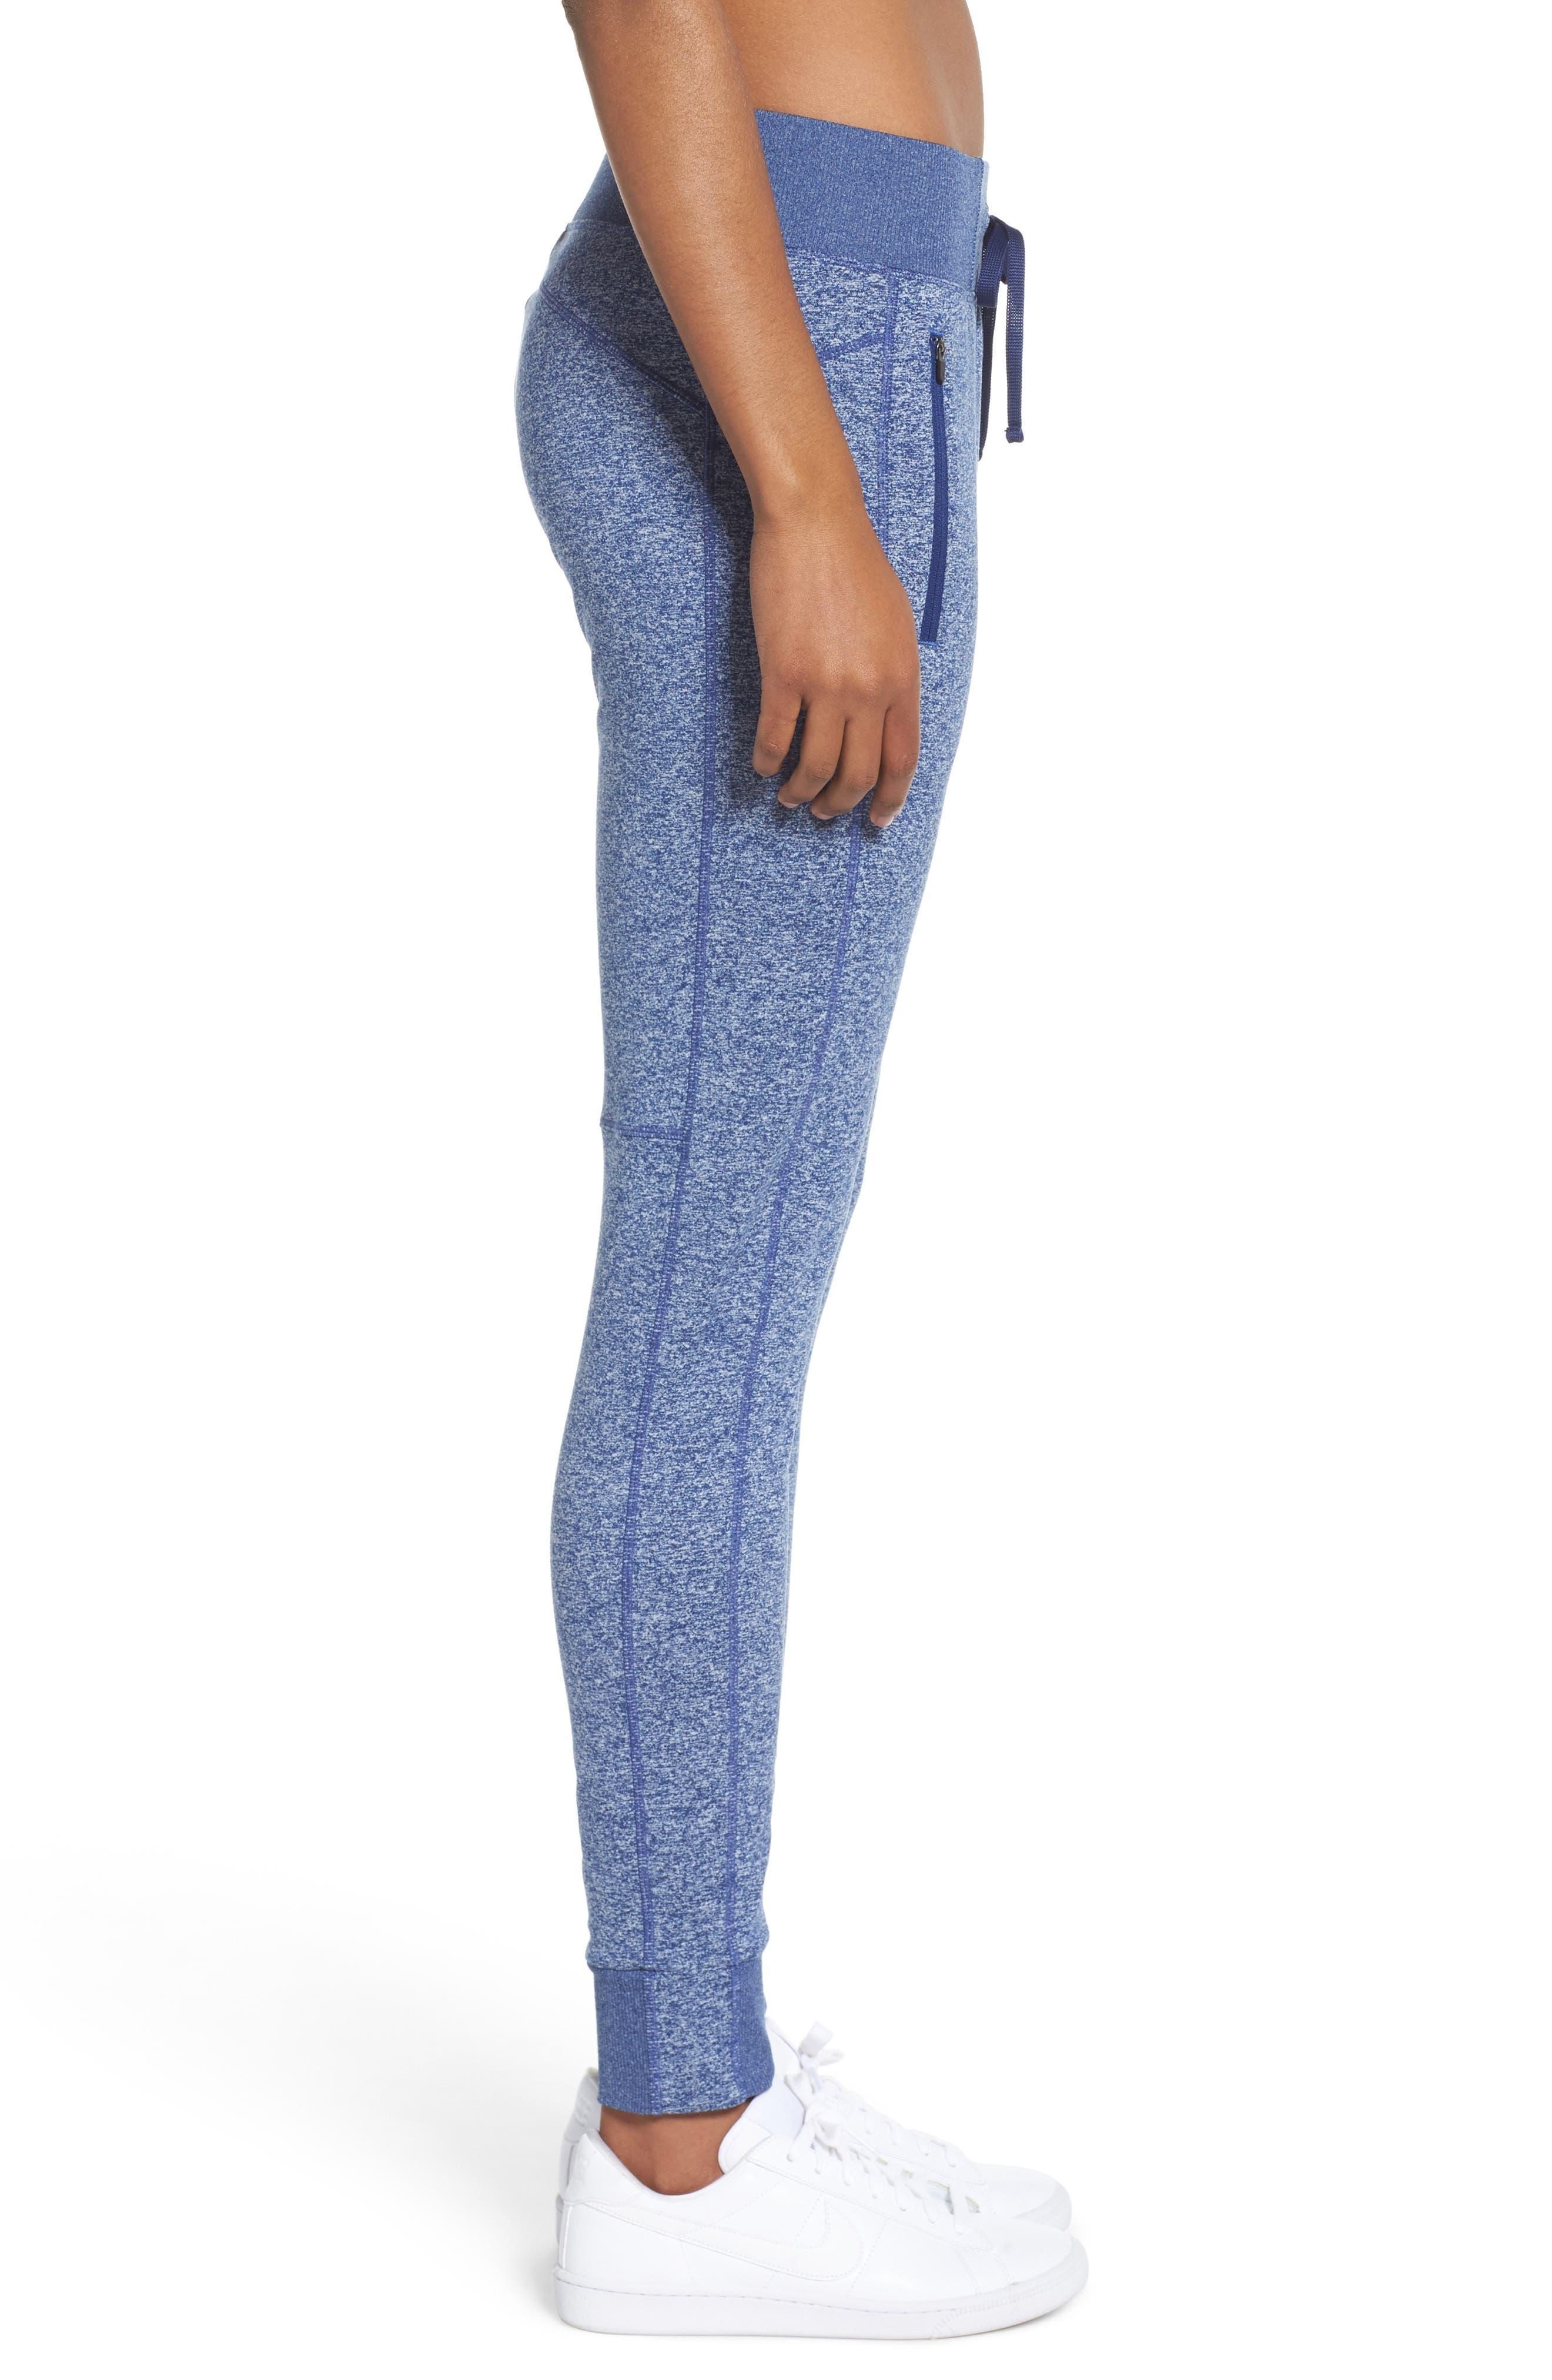 Taryn Sport Knit Pants,                             Alternate thumbnail 3, color,                             Blue Depths Melange